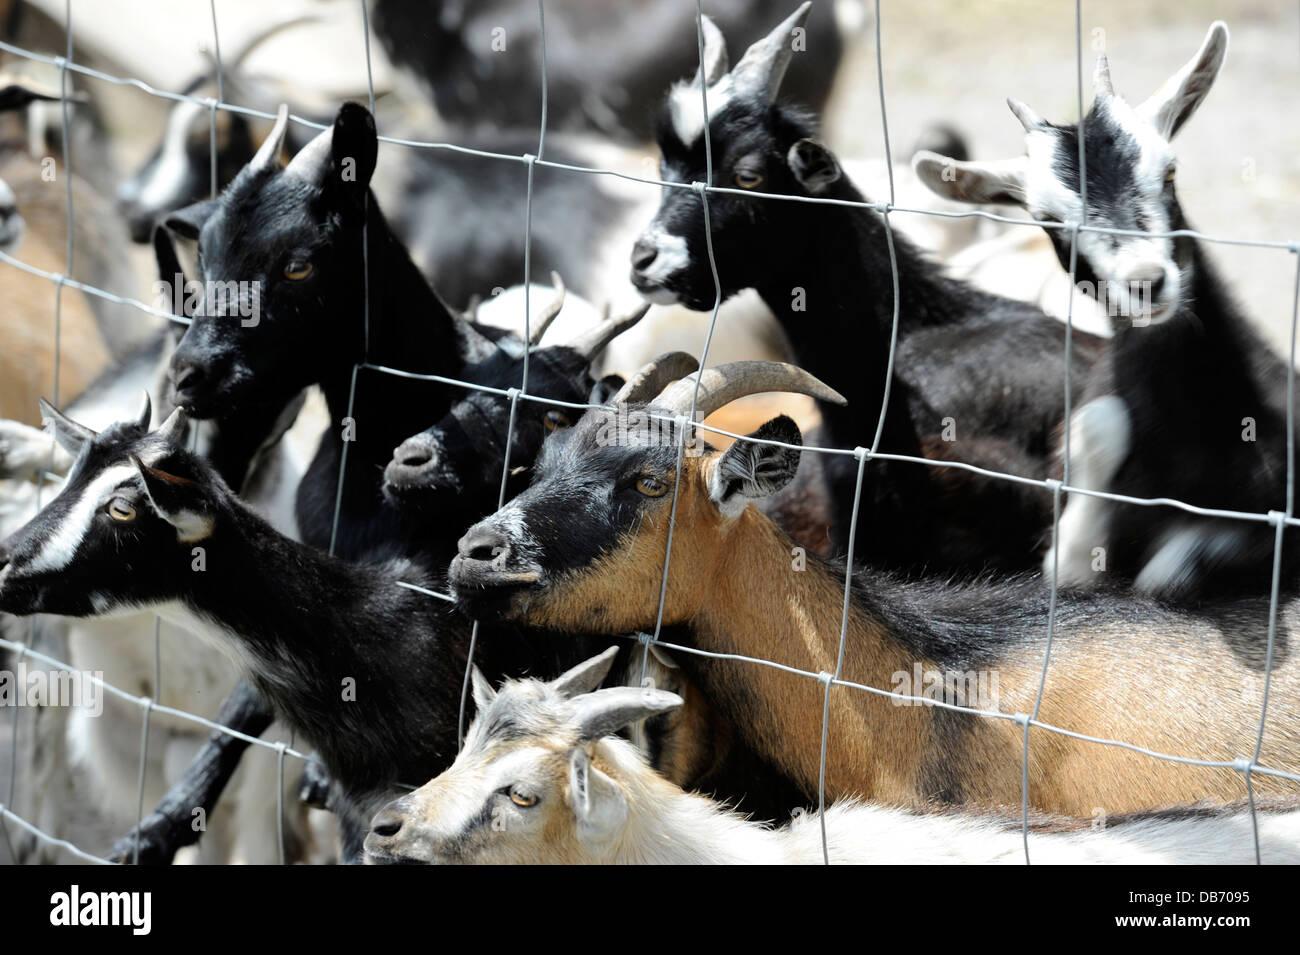 Baby goats waiting to be fed at the Aloha Zoo in Cameron, North Carolina. - Stock Image